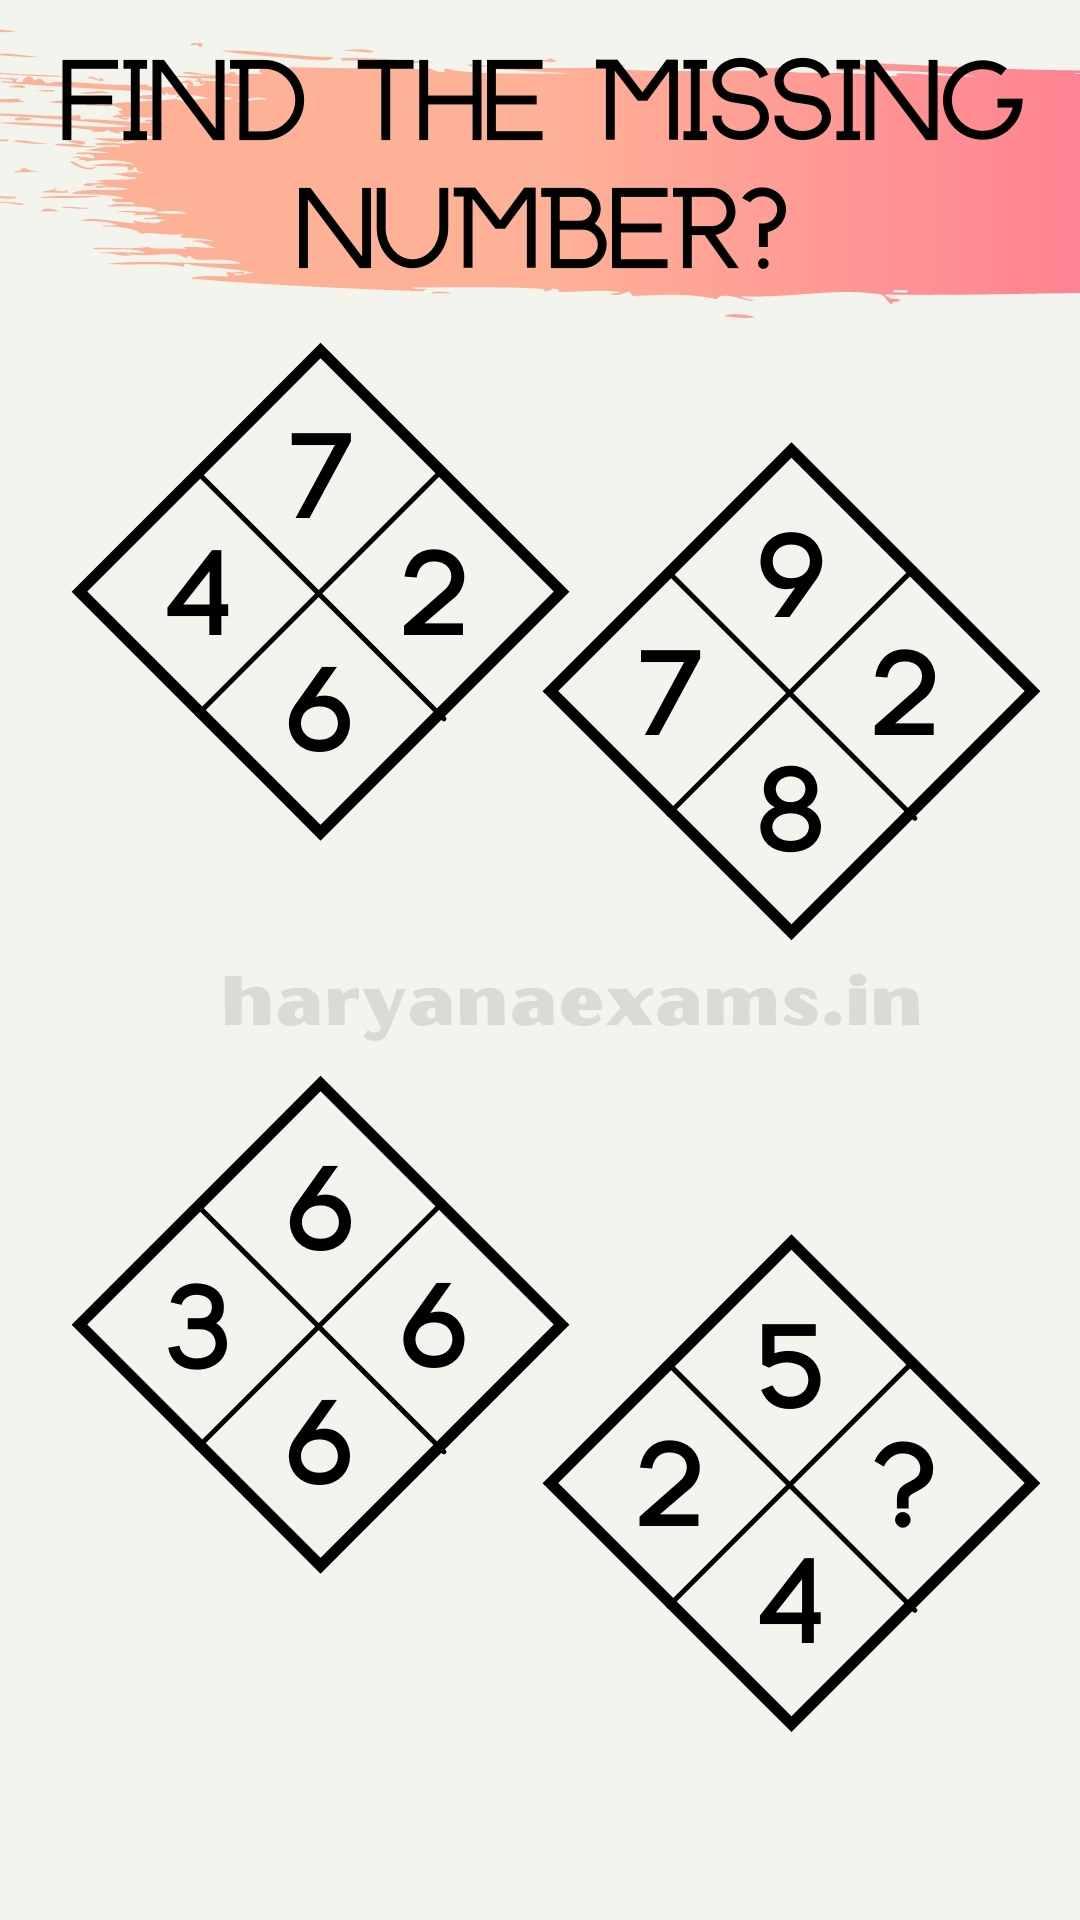 Find the Missing Number 7426, 9782, 6366, 524?